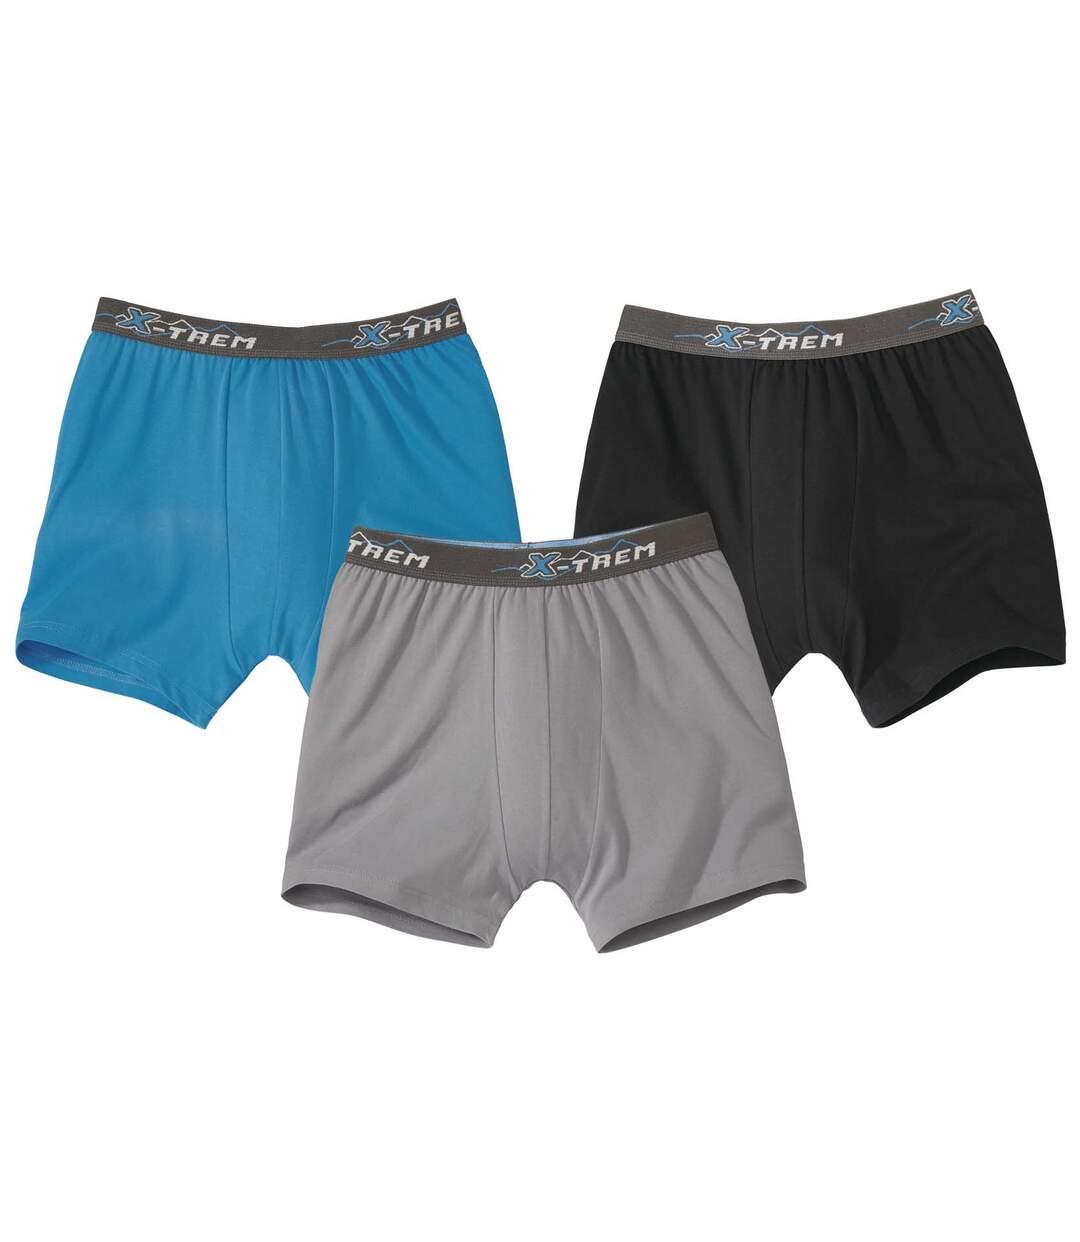 3er-Pack einfarbige Stretch-Boxershorts